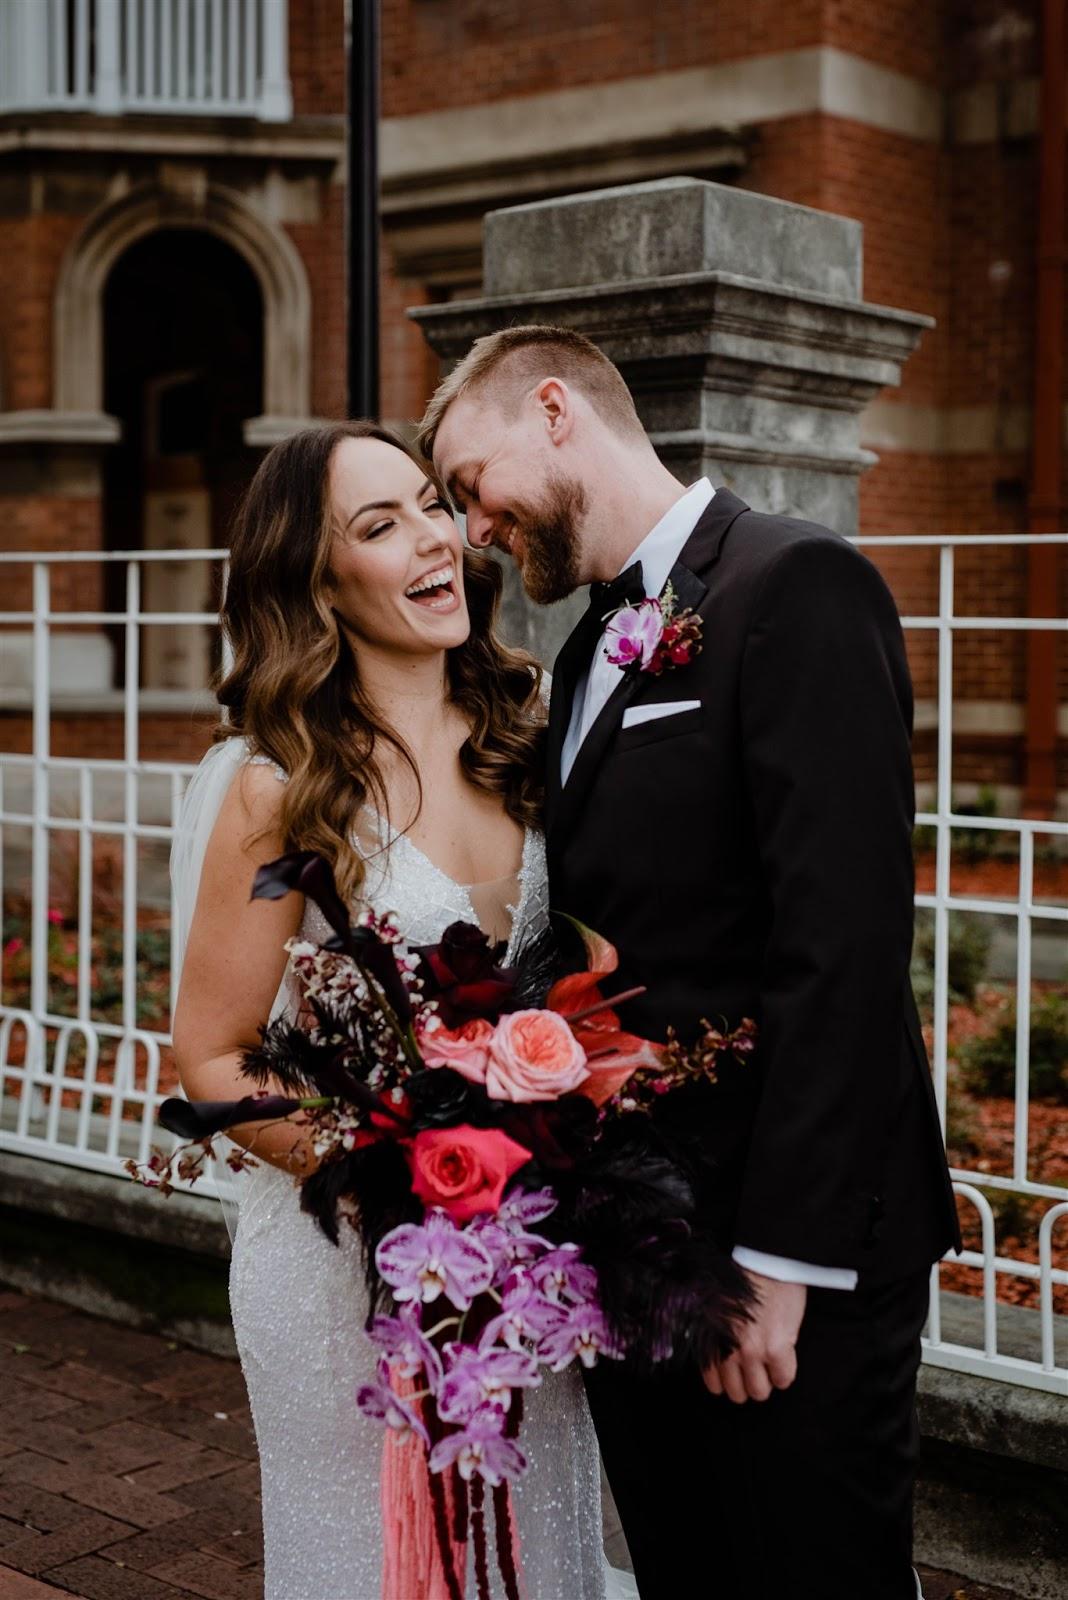 amanda afton photography australian bridal gown designer real bride weddings venues cake videography